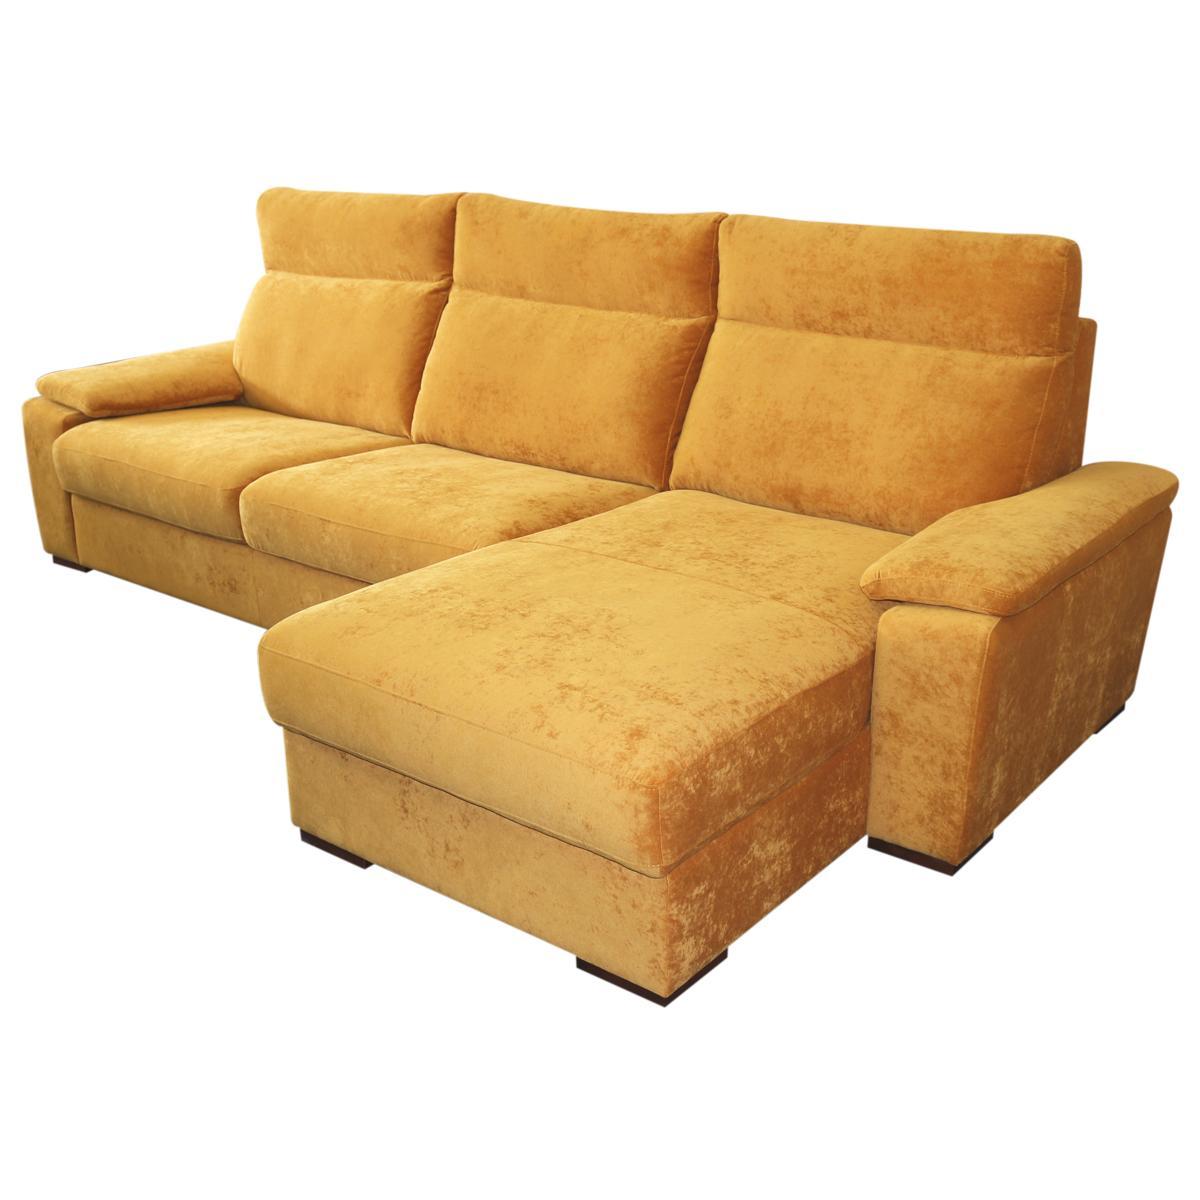 Zlatá rohová sedačka TESLA - Obrázok č. 1